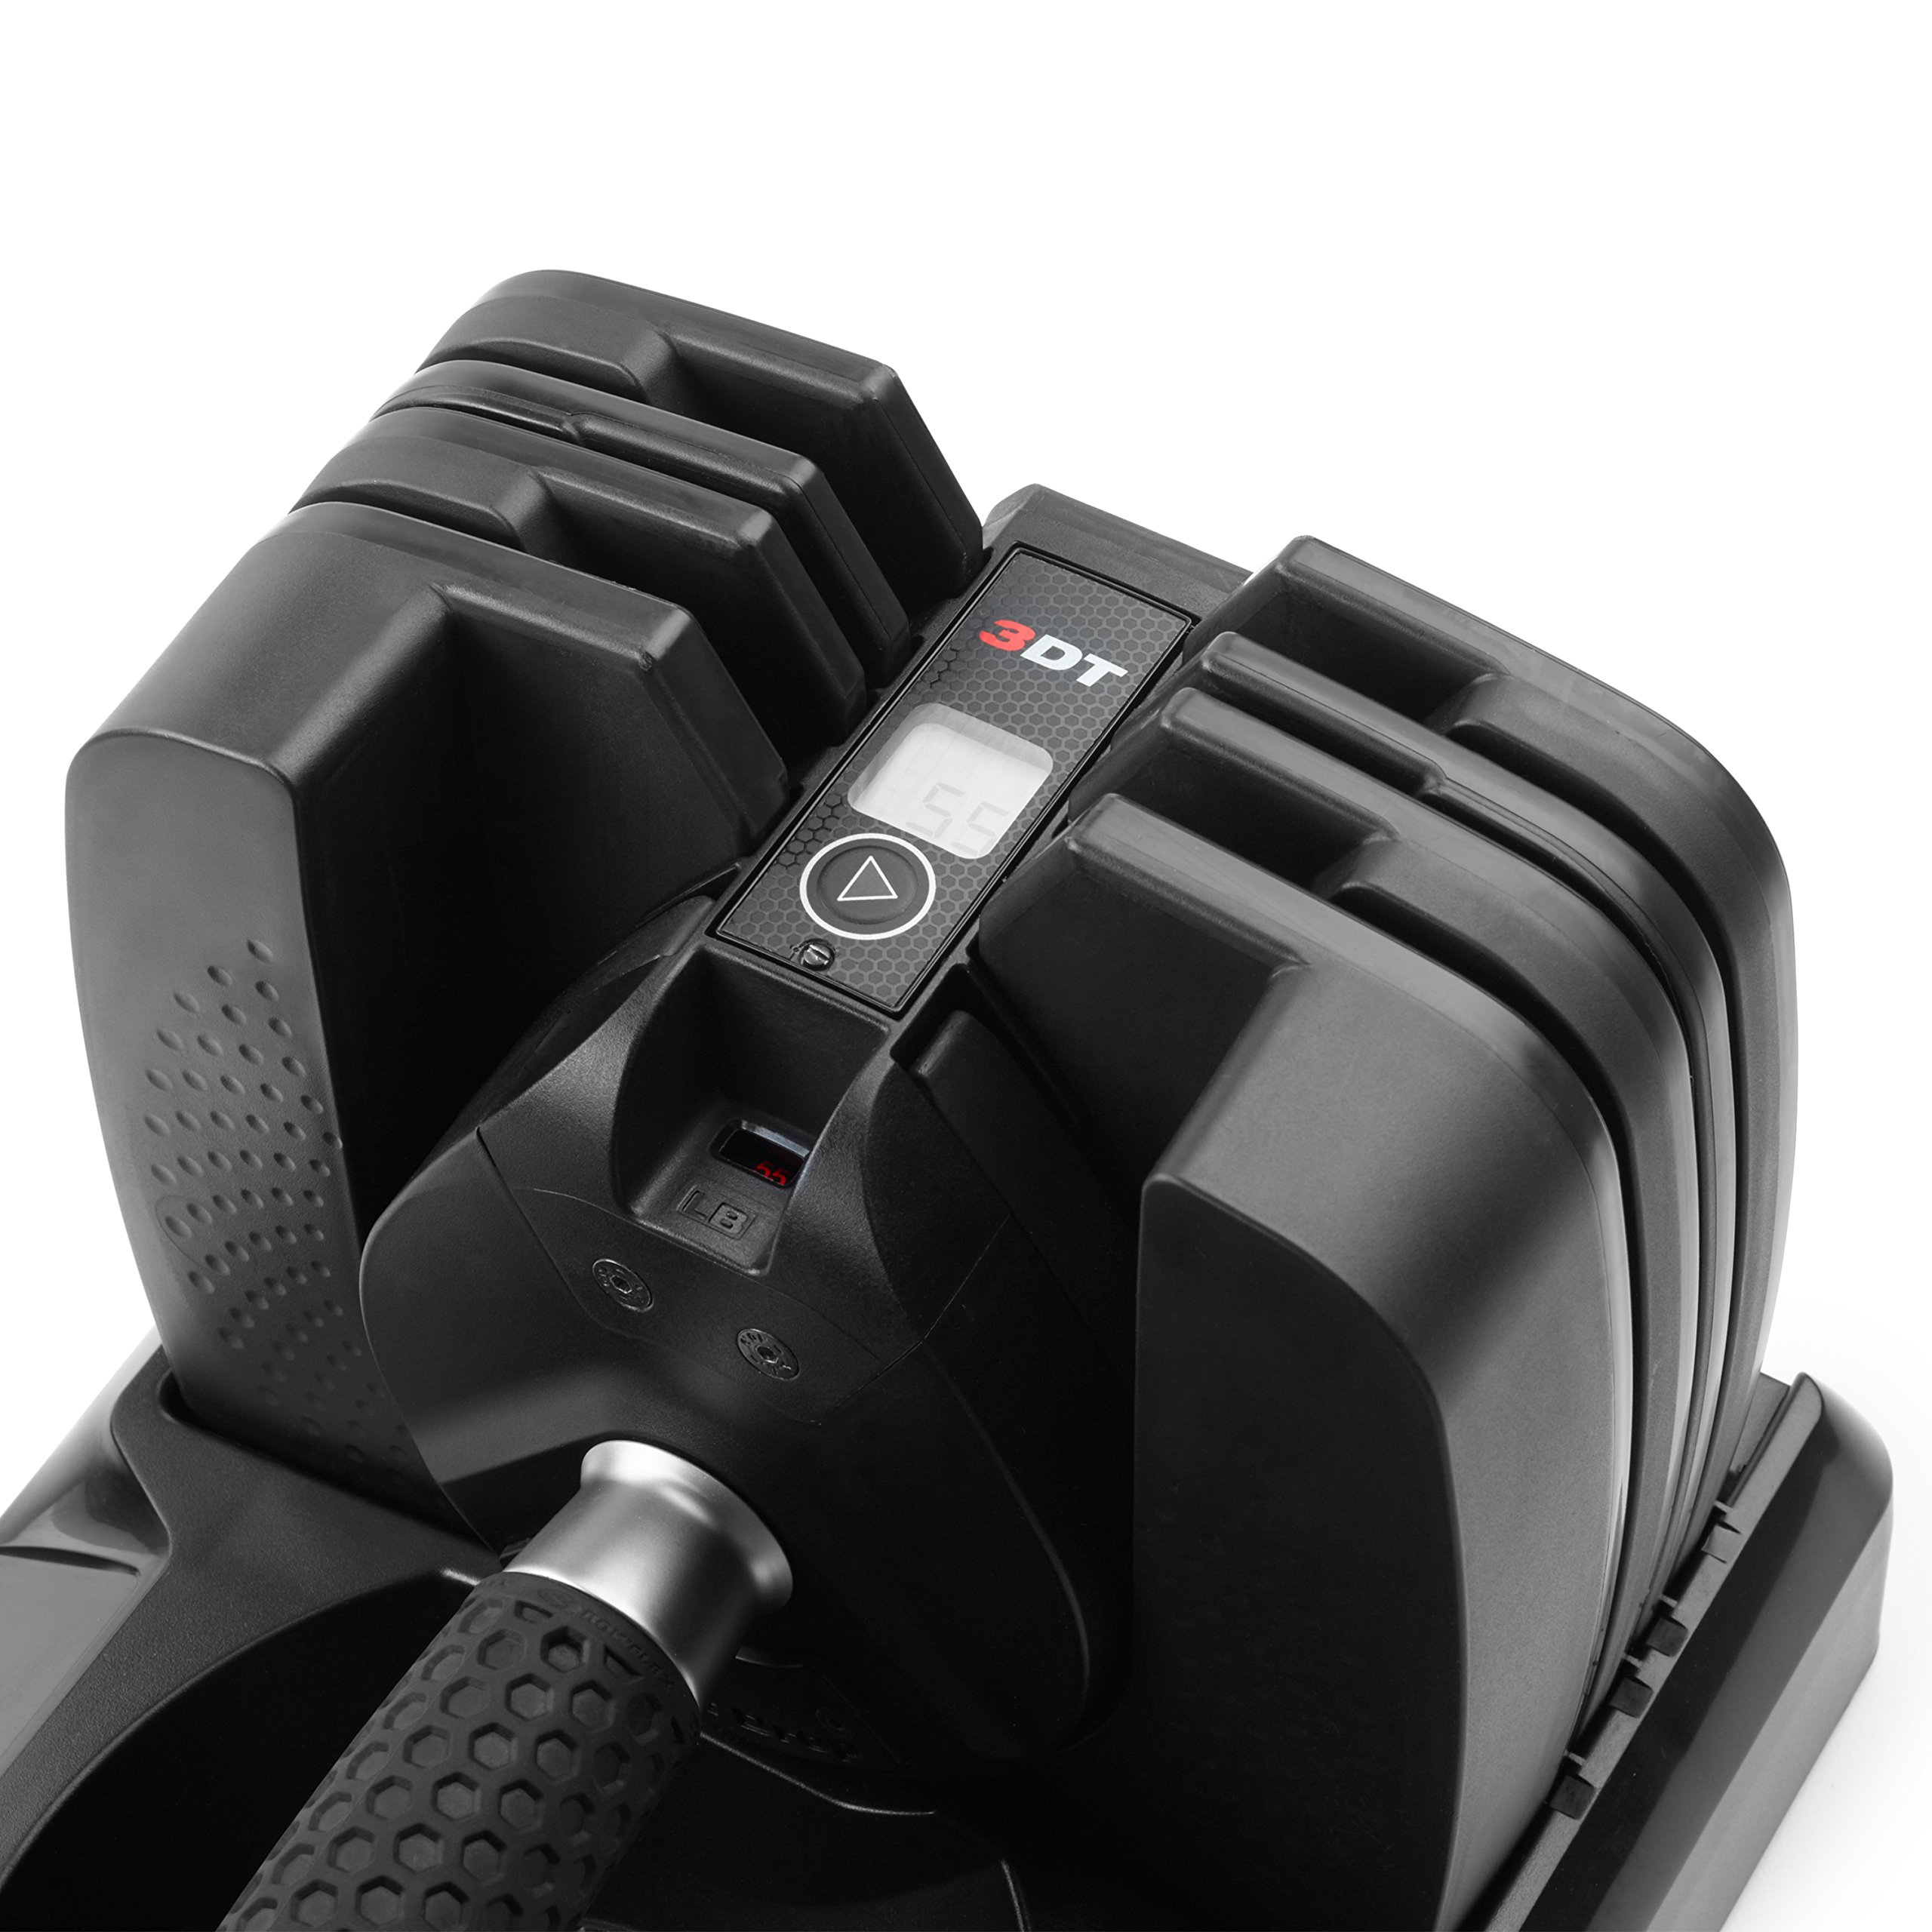 Dumbbell Set Price Philippines: Bowflex SelectTech 560 Dumbbell (Pair